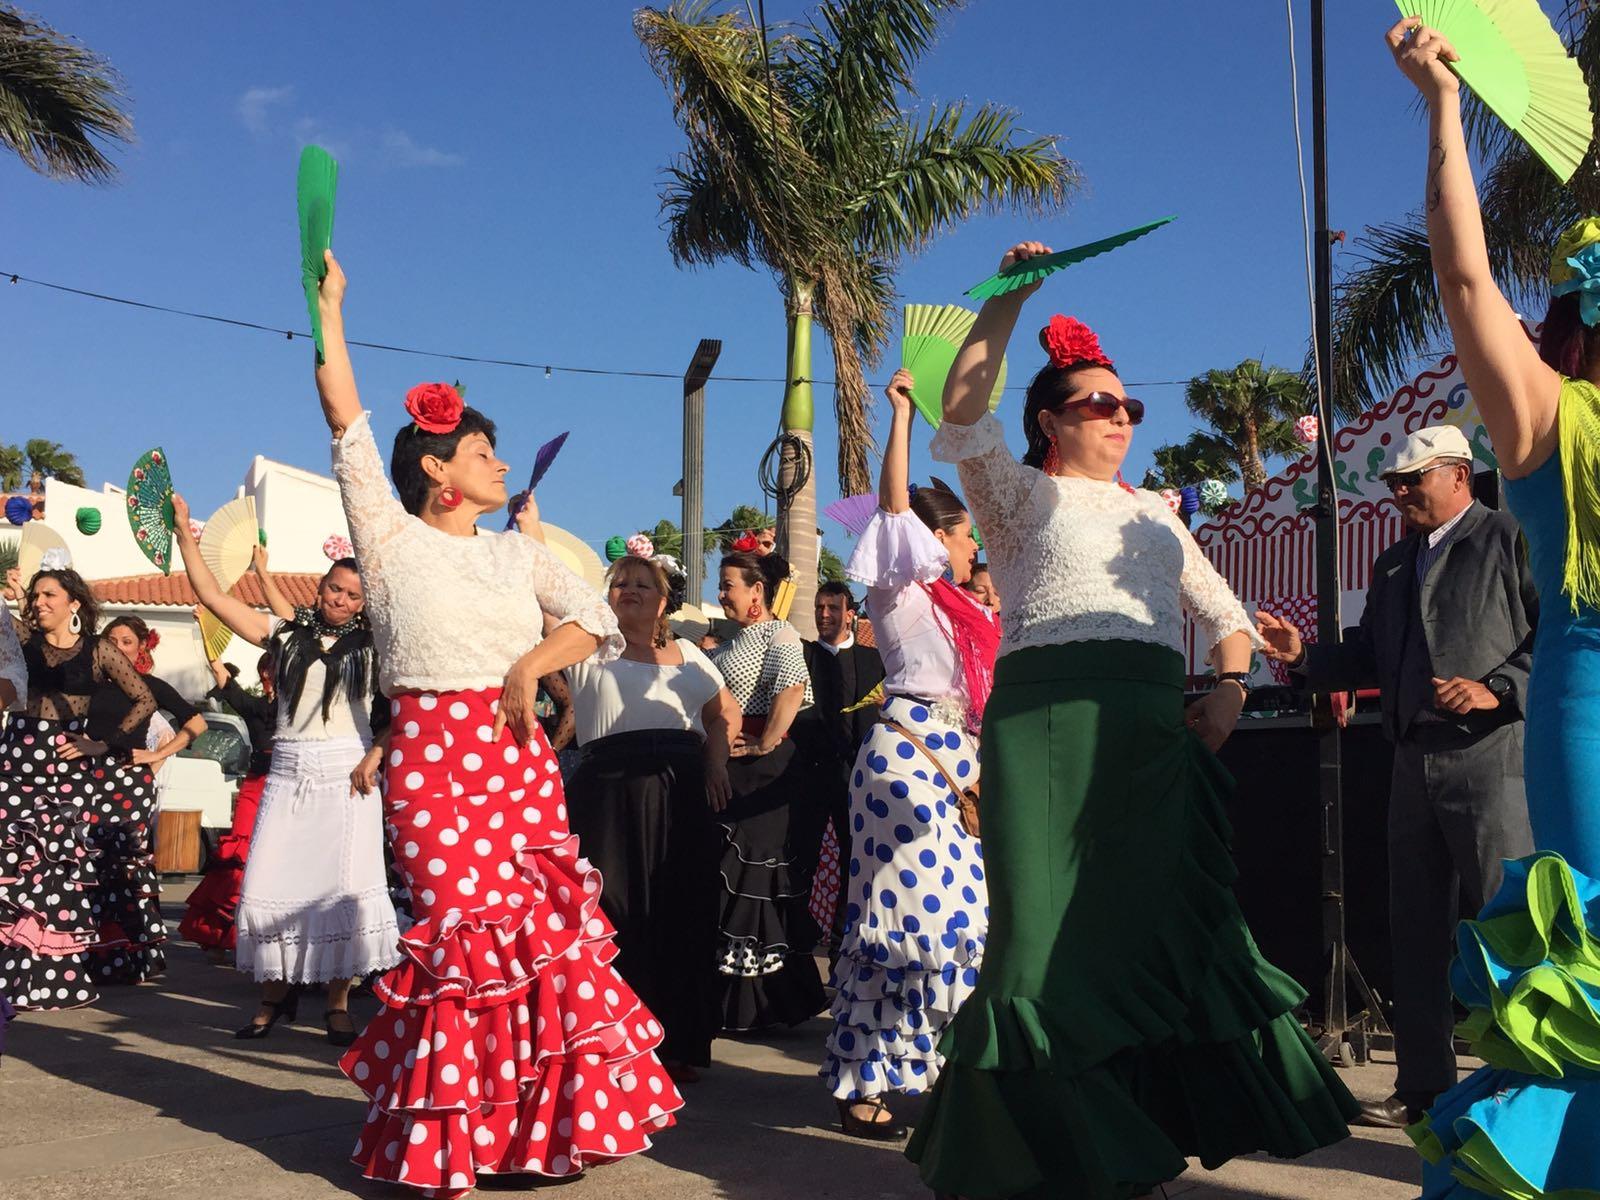 Feria de Abril en Caleta de Fuste, Fuerteventura